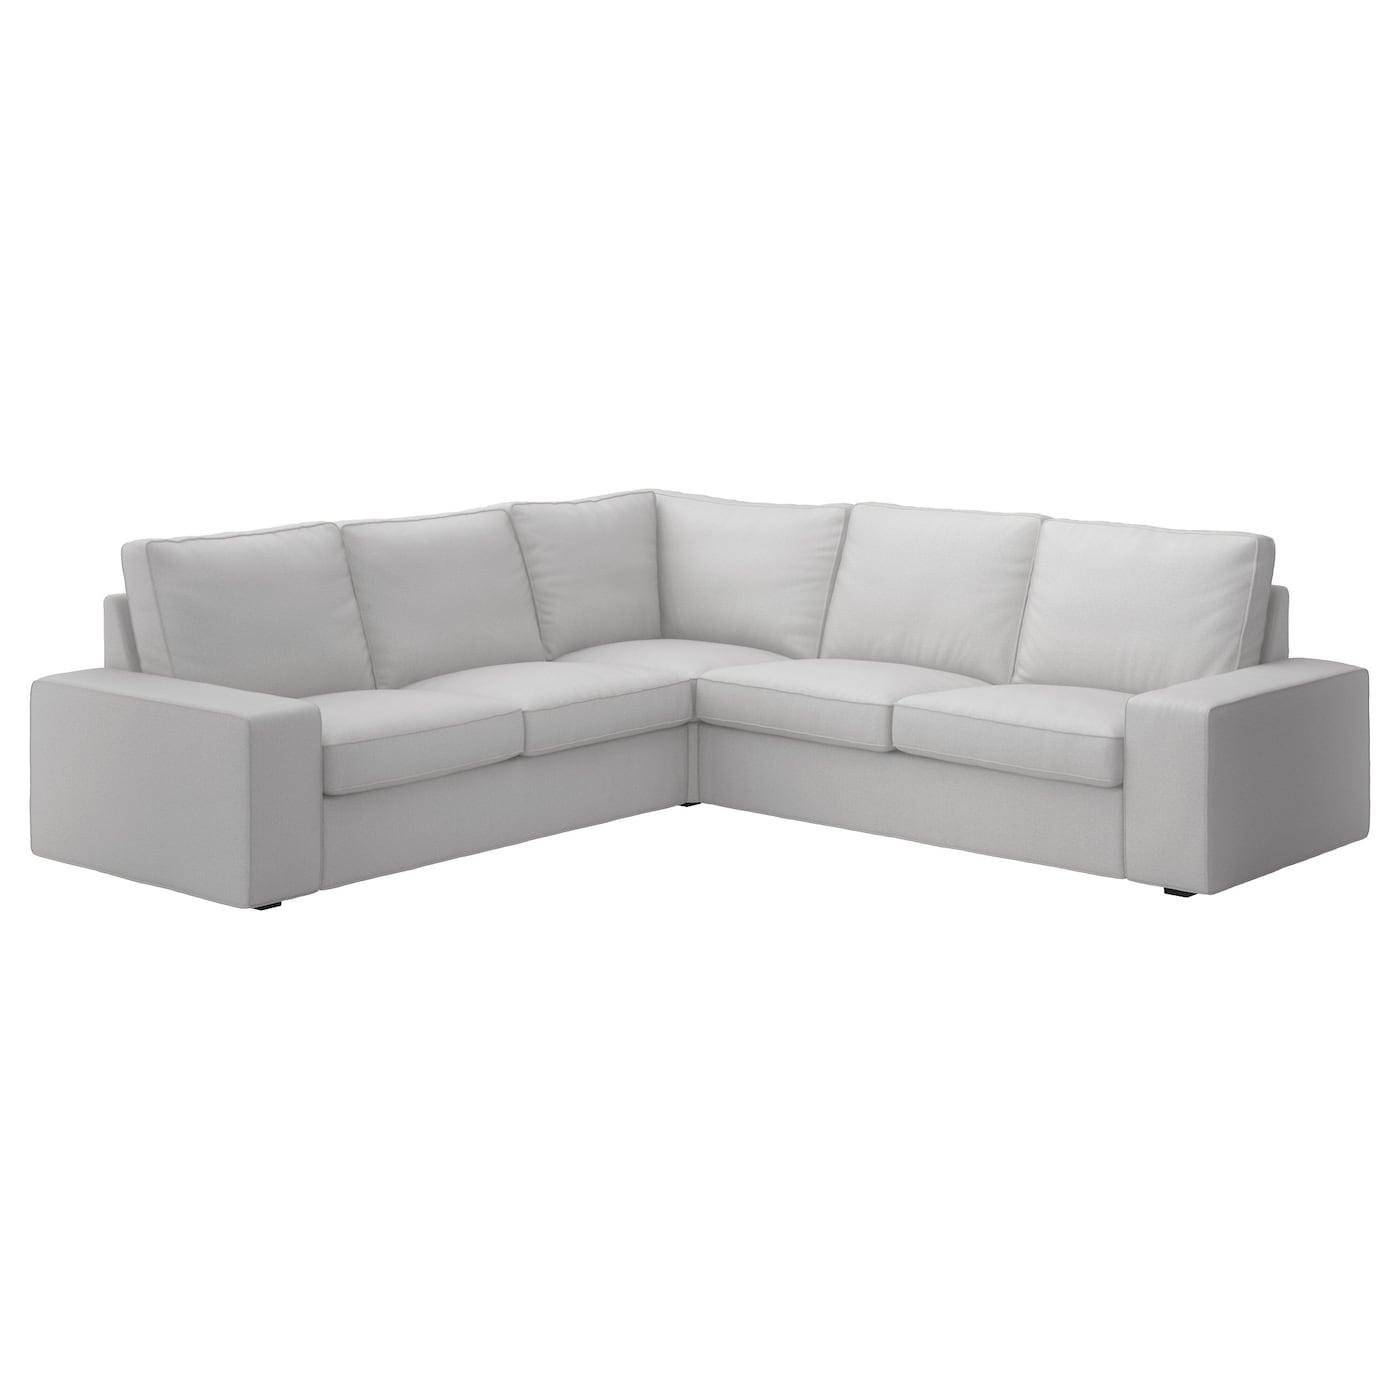 Kivik corner sofa 4 seat ramna light grey ikea - Divani ikea kivik opinioni ...